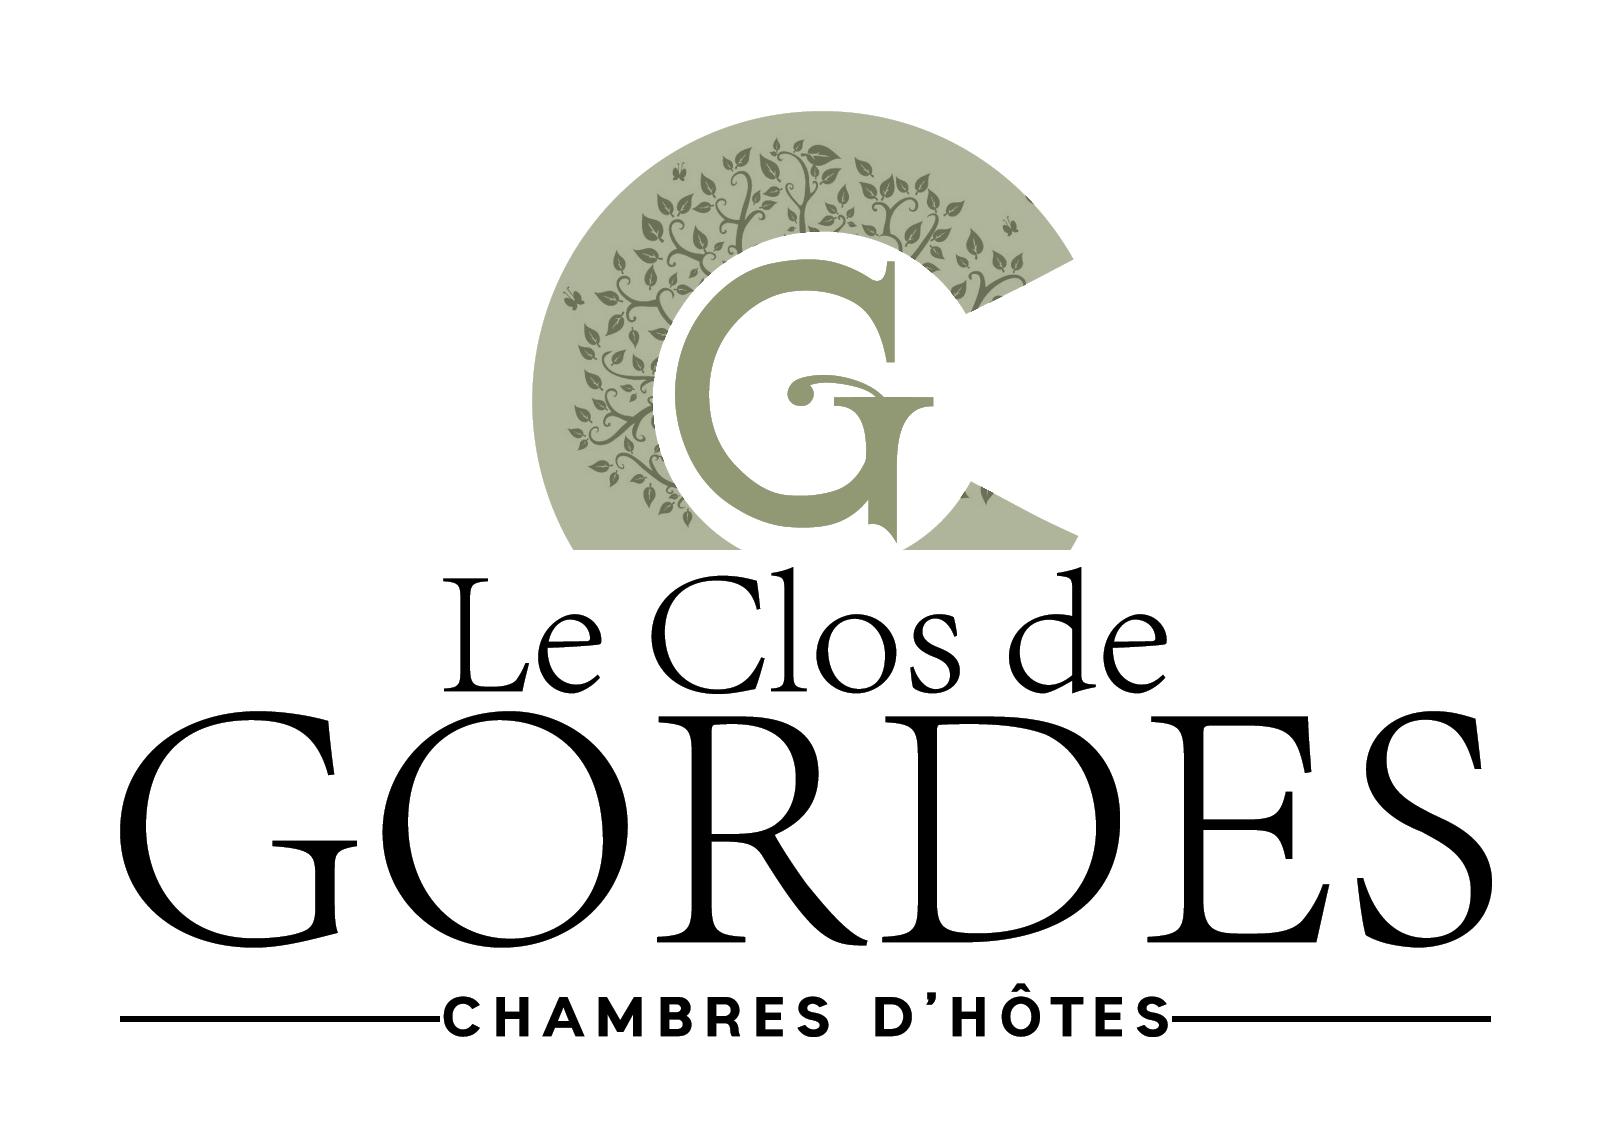 Le Clos de Gordes